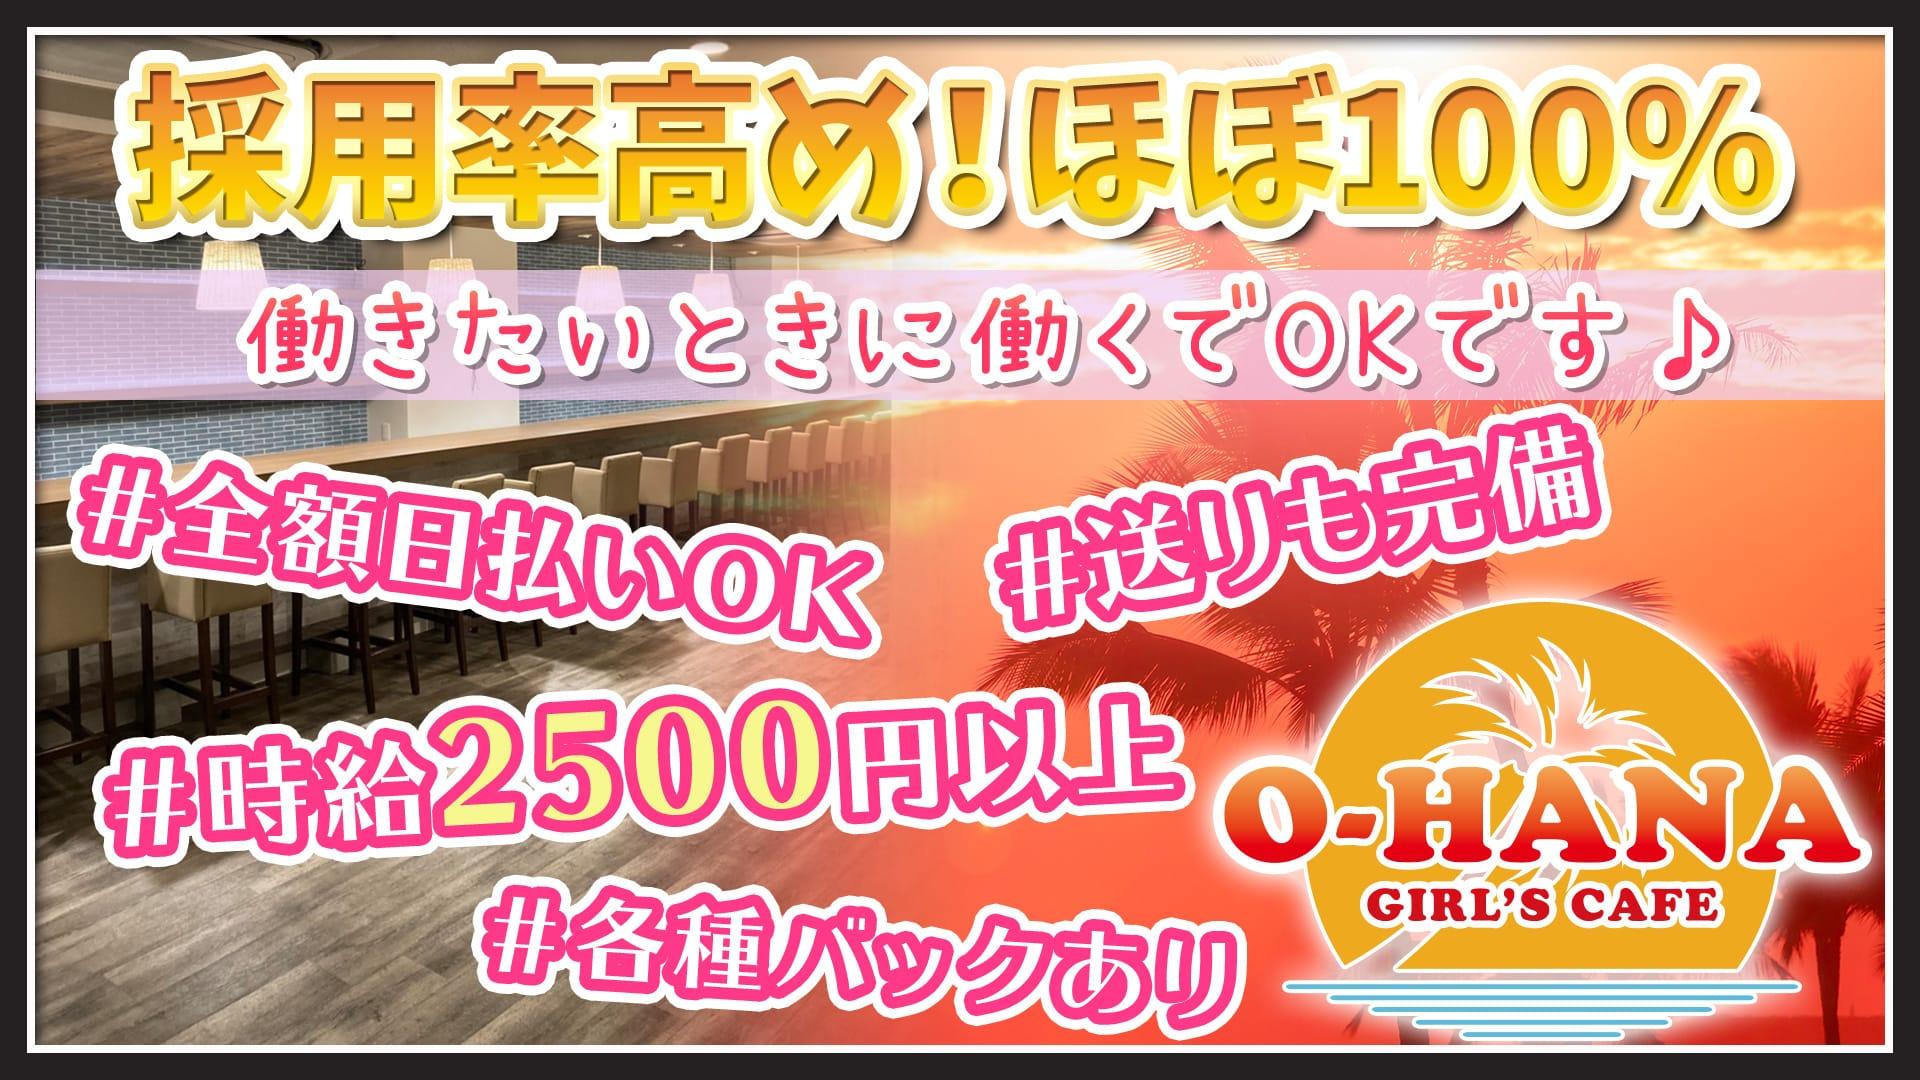 GIRL'S CAFE O-HANA(オハナ) 錦糸町ガールズバー TOP画像